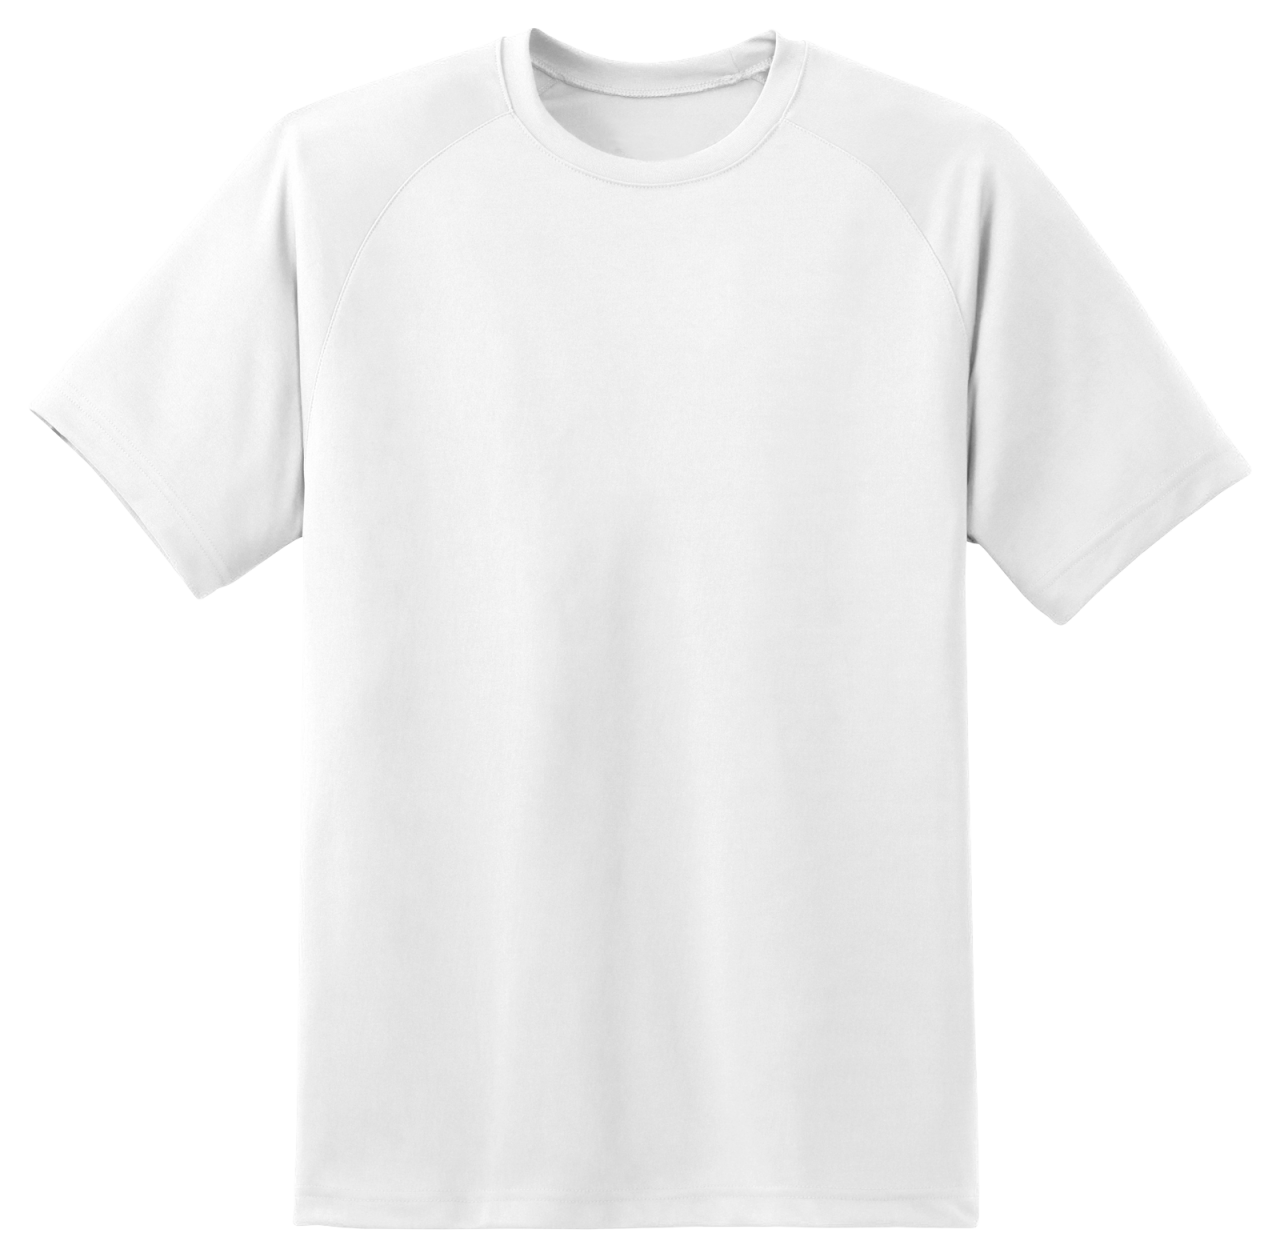 White Tshirt PNG Image - PurePNG | Free transparent CC0 ...